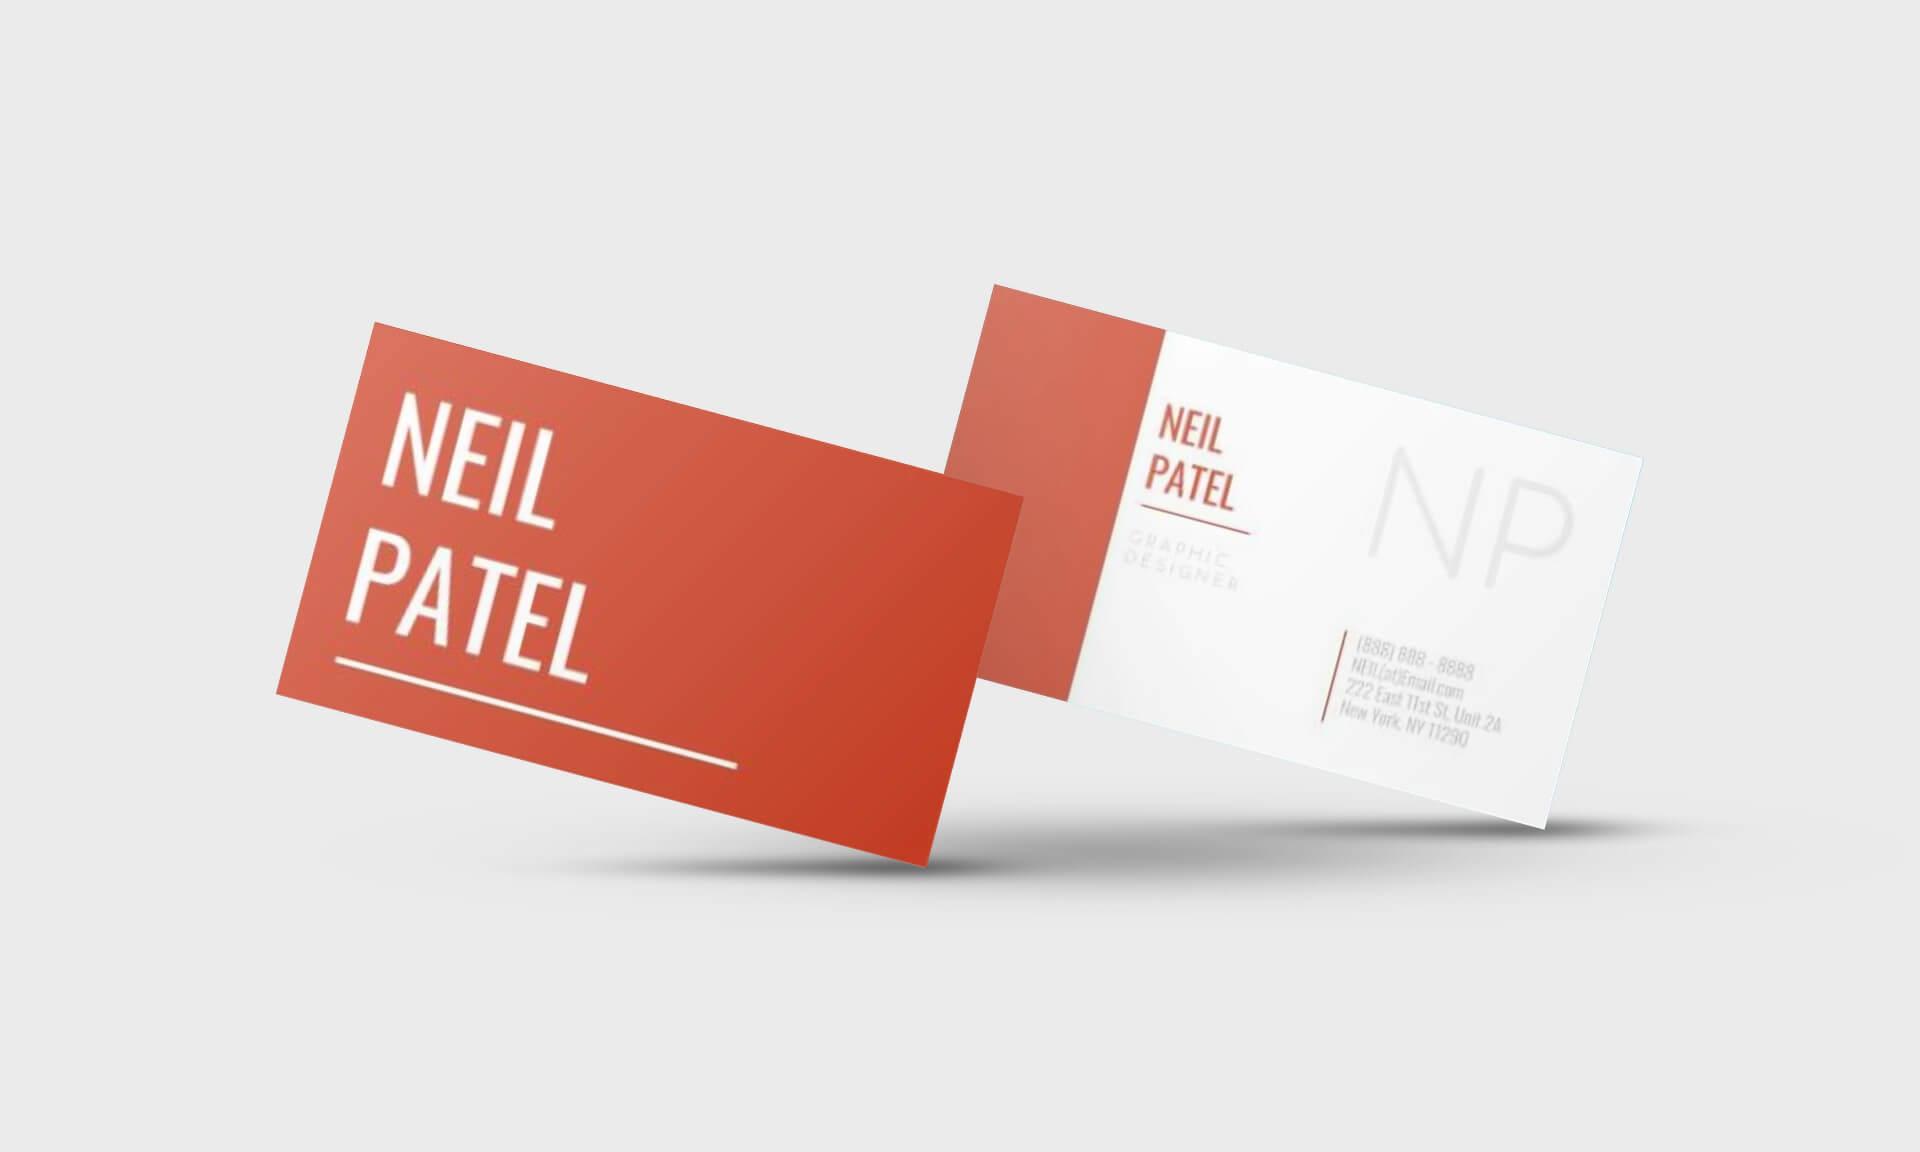 Neil Patel Google Docs Business Card Template - Stand Out Shop With Business Card Template For Google Docs